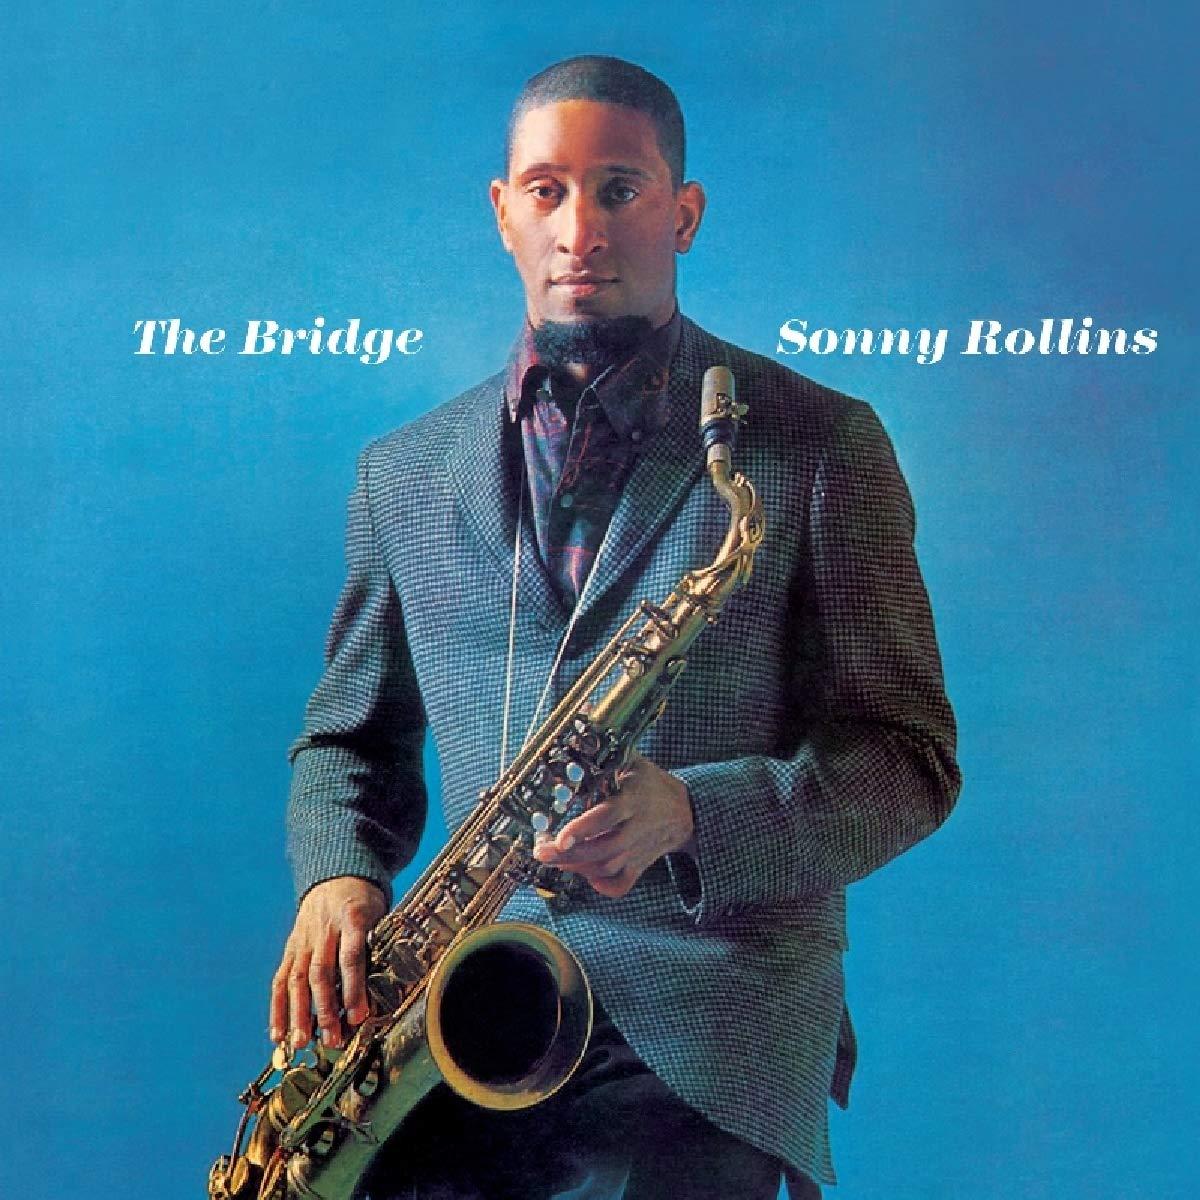 Sonny Rollins - The Bridge - Amazon.com Music